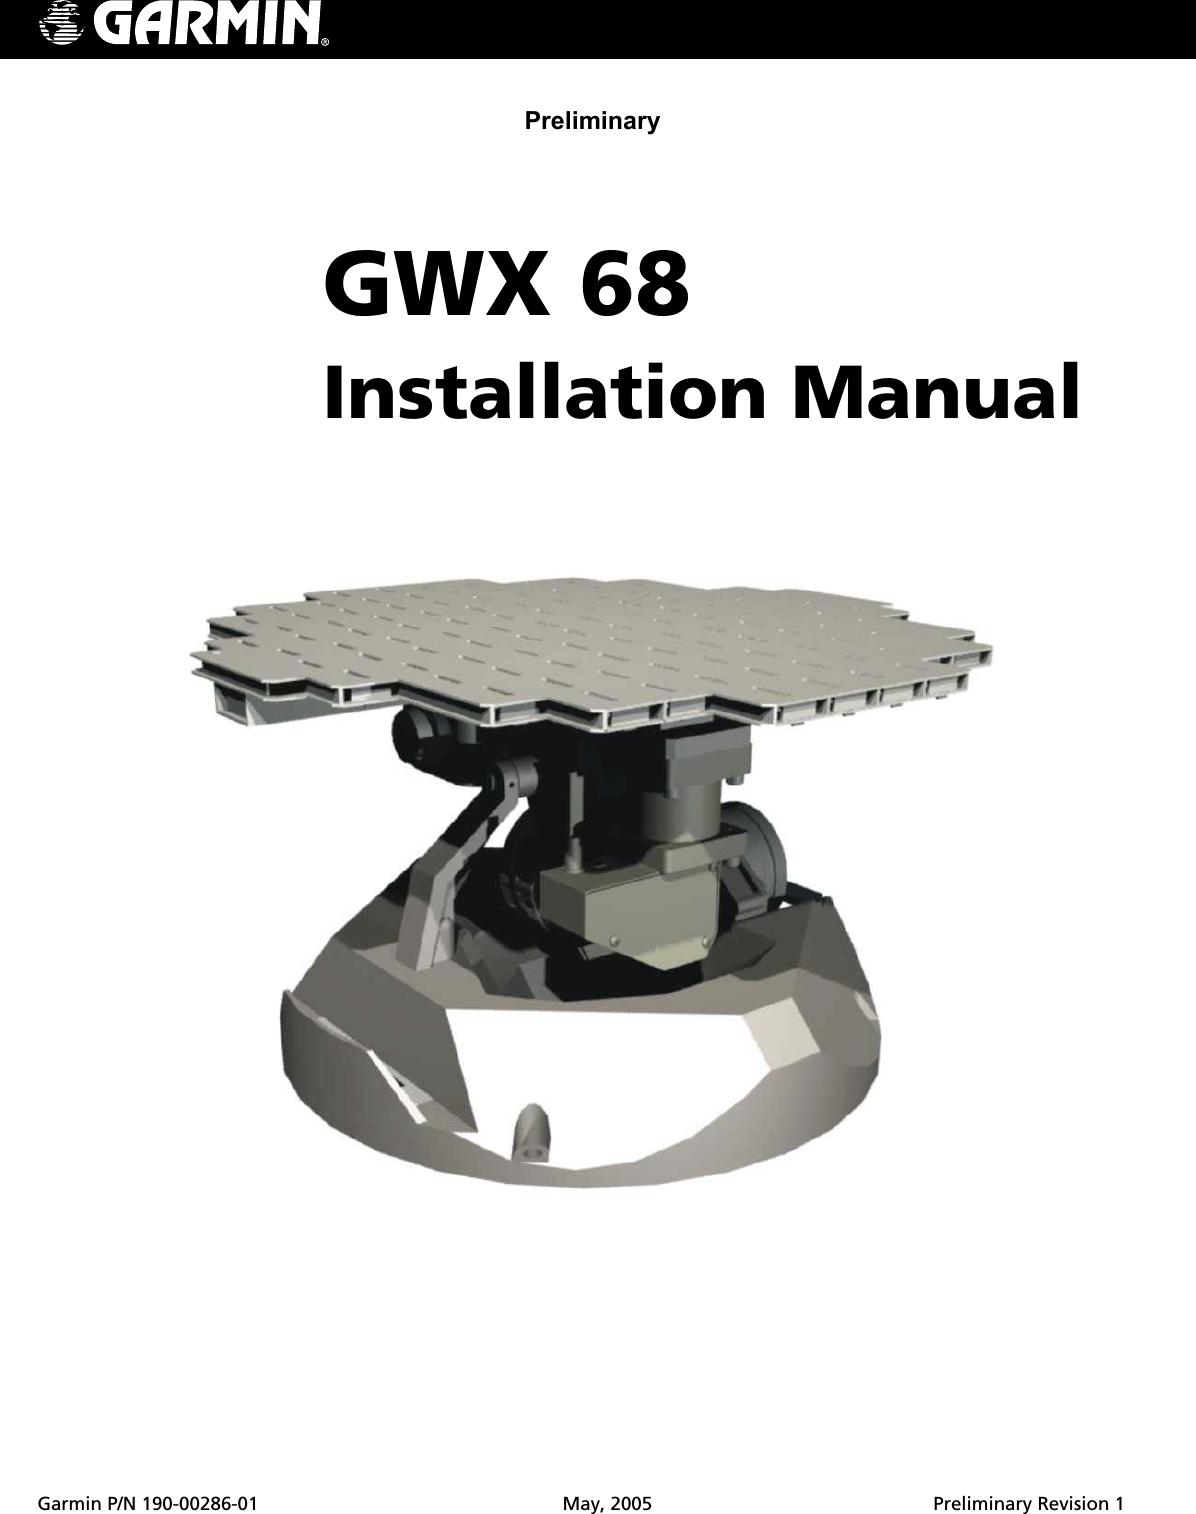 Garmin 0060200 Aircraft Mounted Weather Radar Transmitter User Wiring Diagram P N 190 00286 01 May 2005 Preliminary Revision 1preliminarygwx 68installation